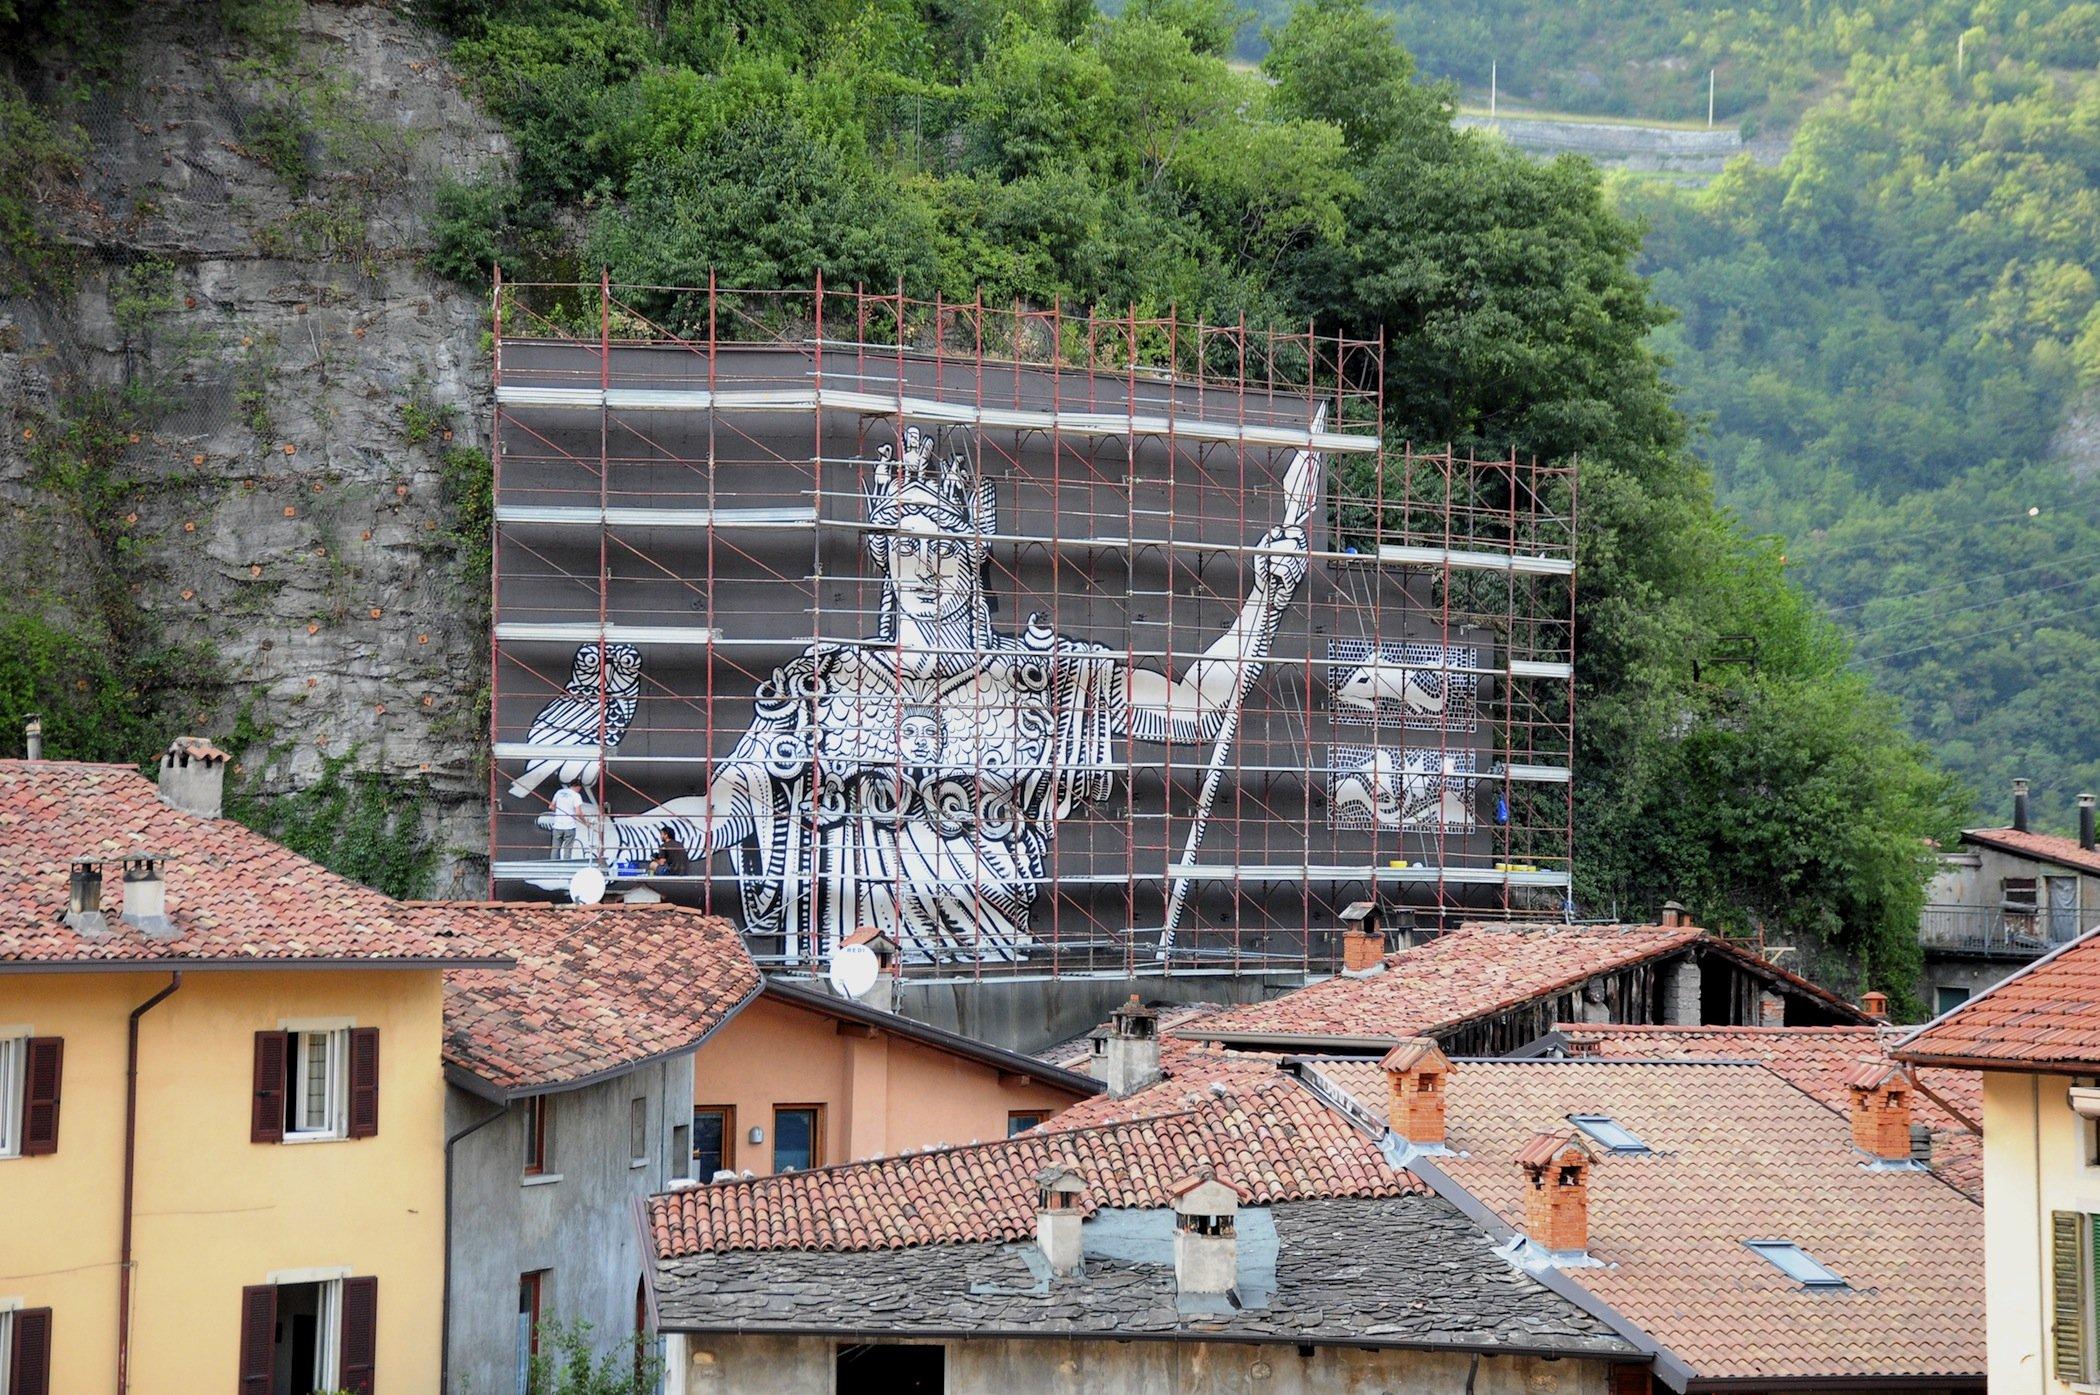 Minerva , Breno , Wall In Art 2015 work in progress